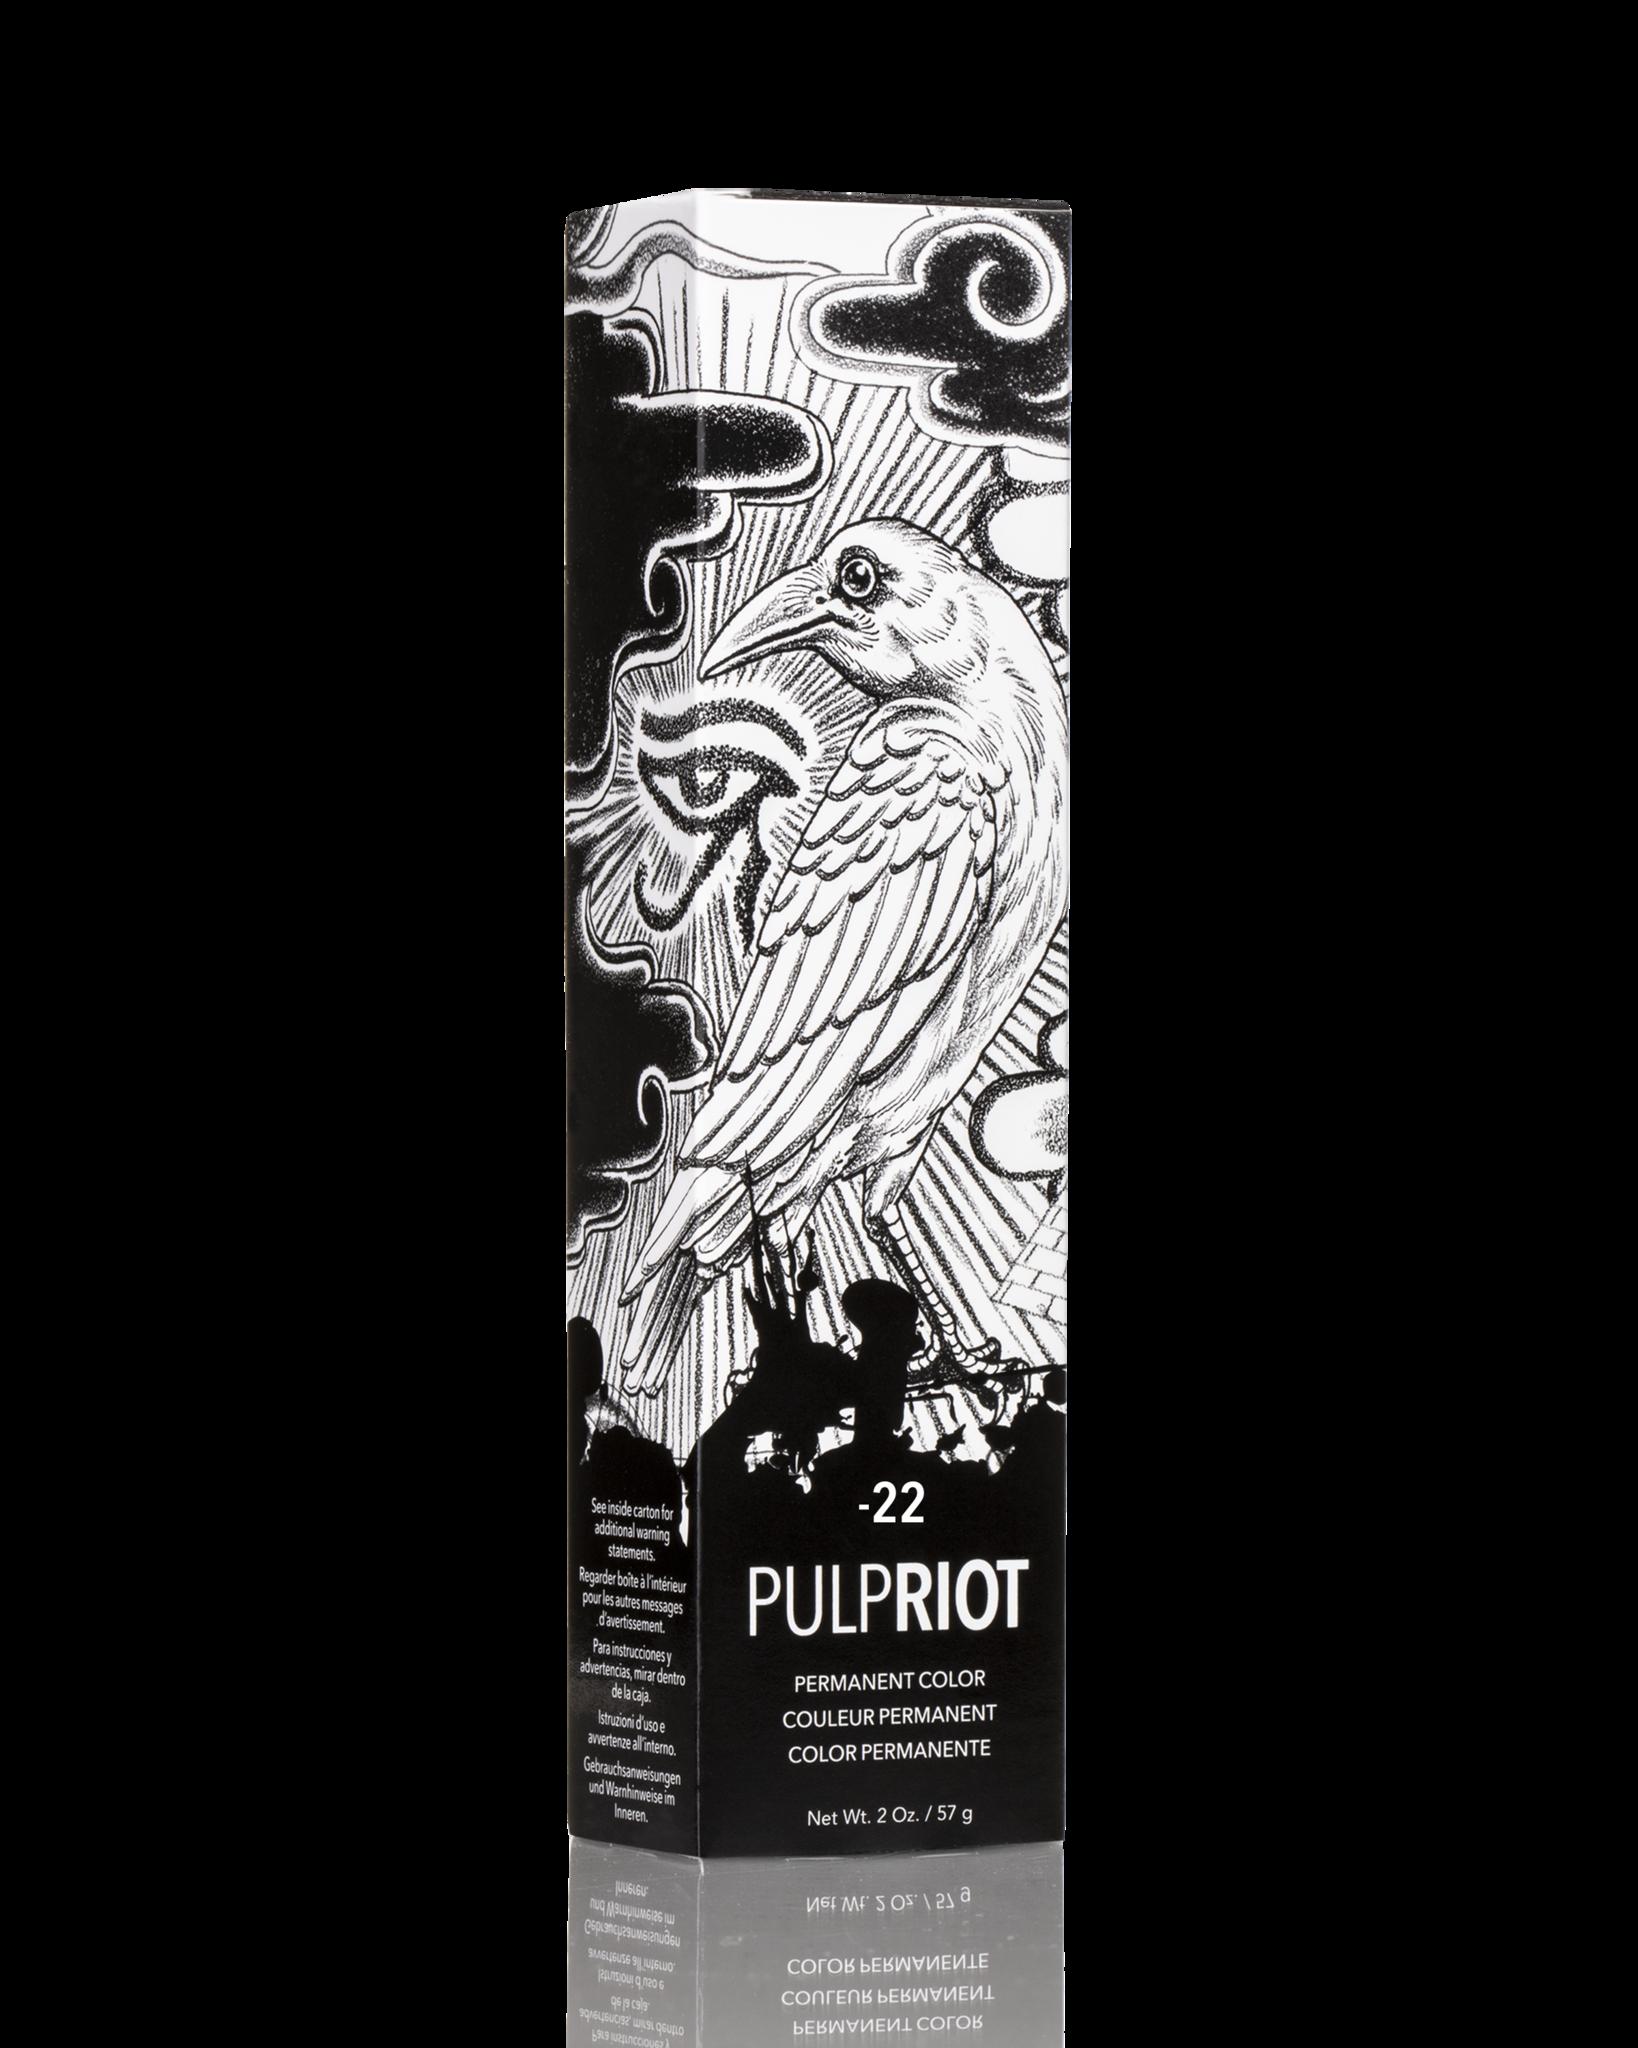 Pulp Riot PULP RIOT FACTION 8 BOOSTER -22